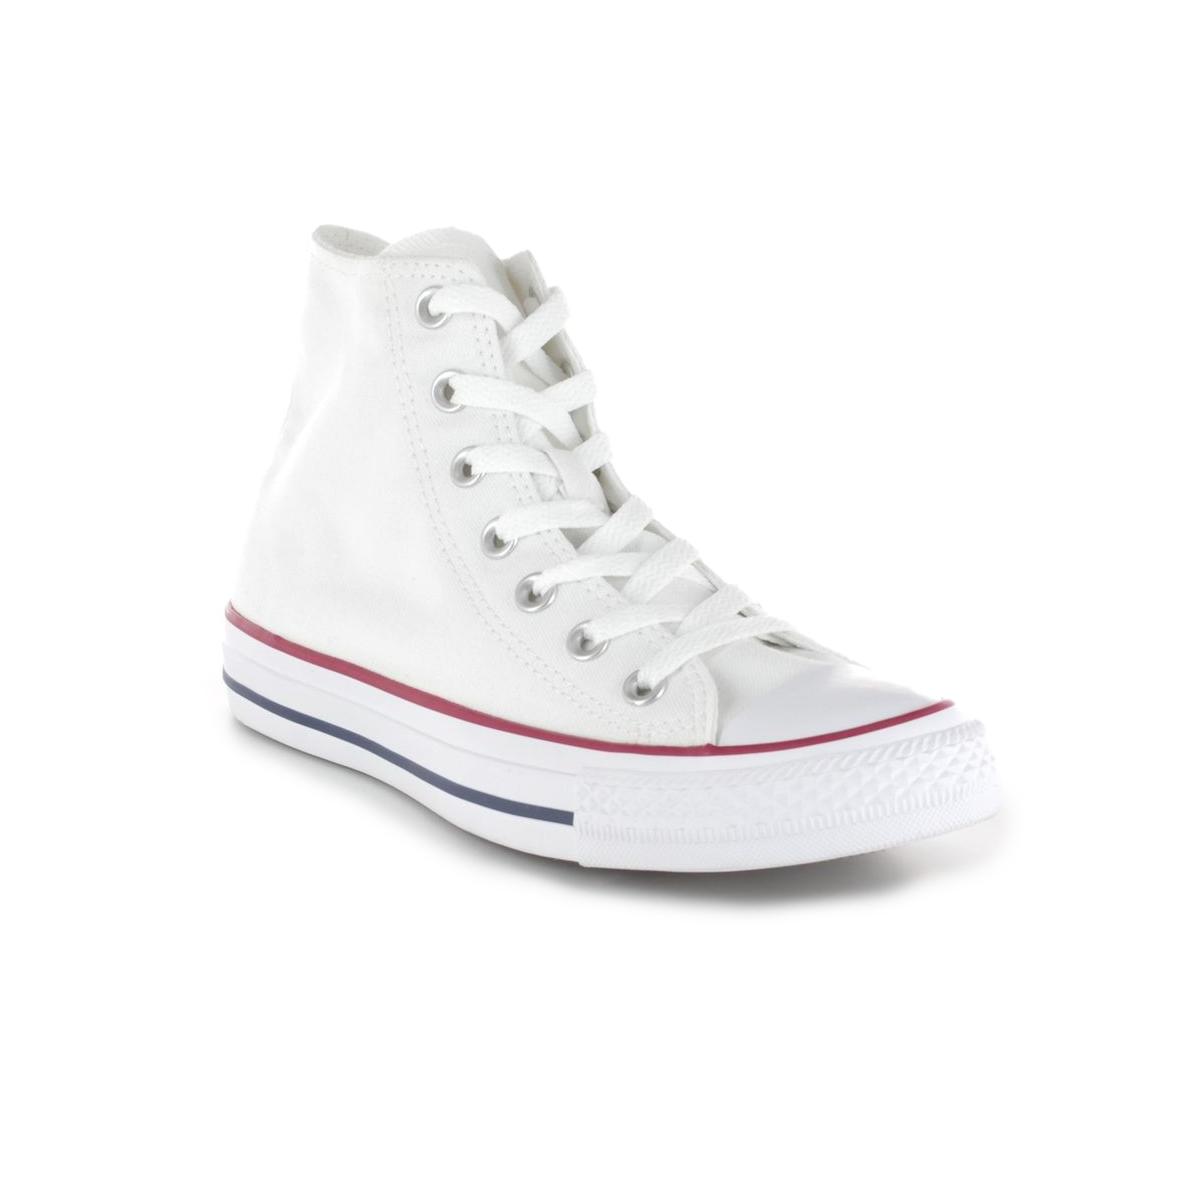 Converse M7650C All Star HI Top White